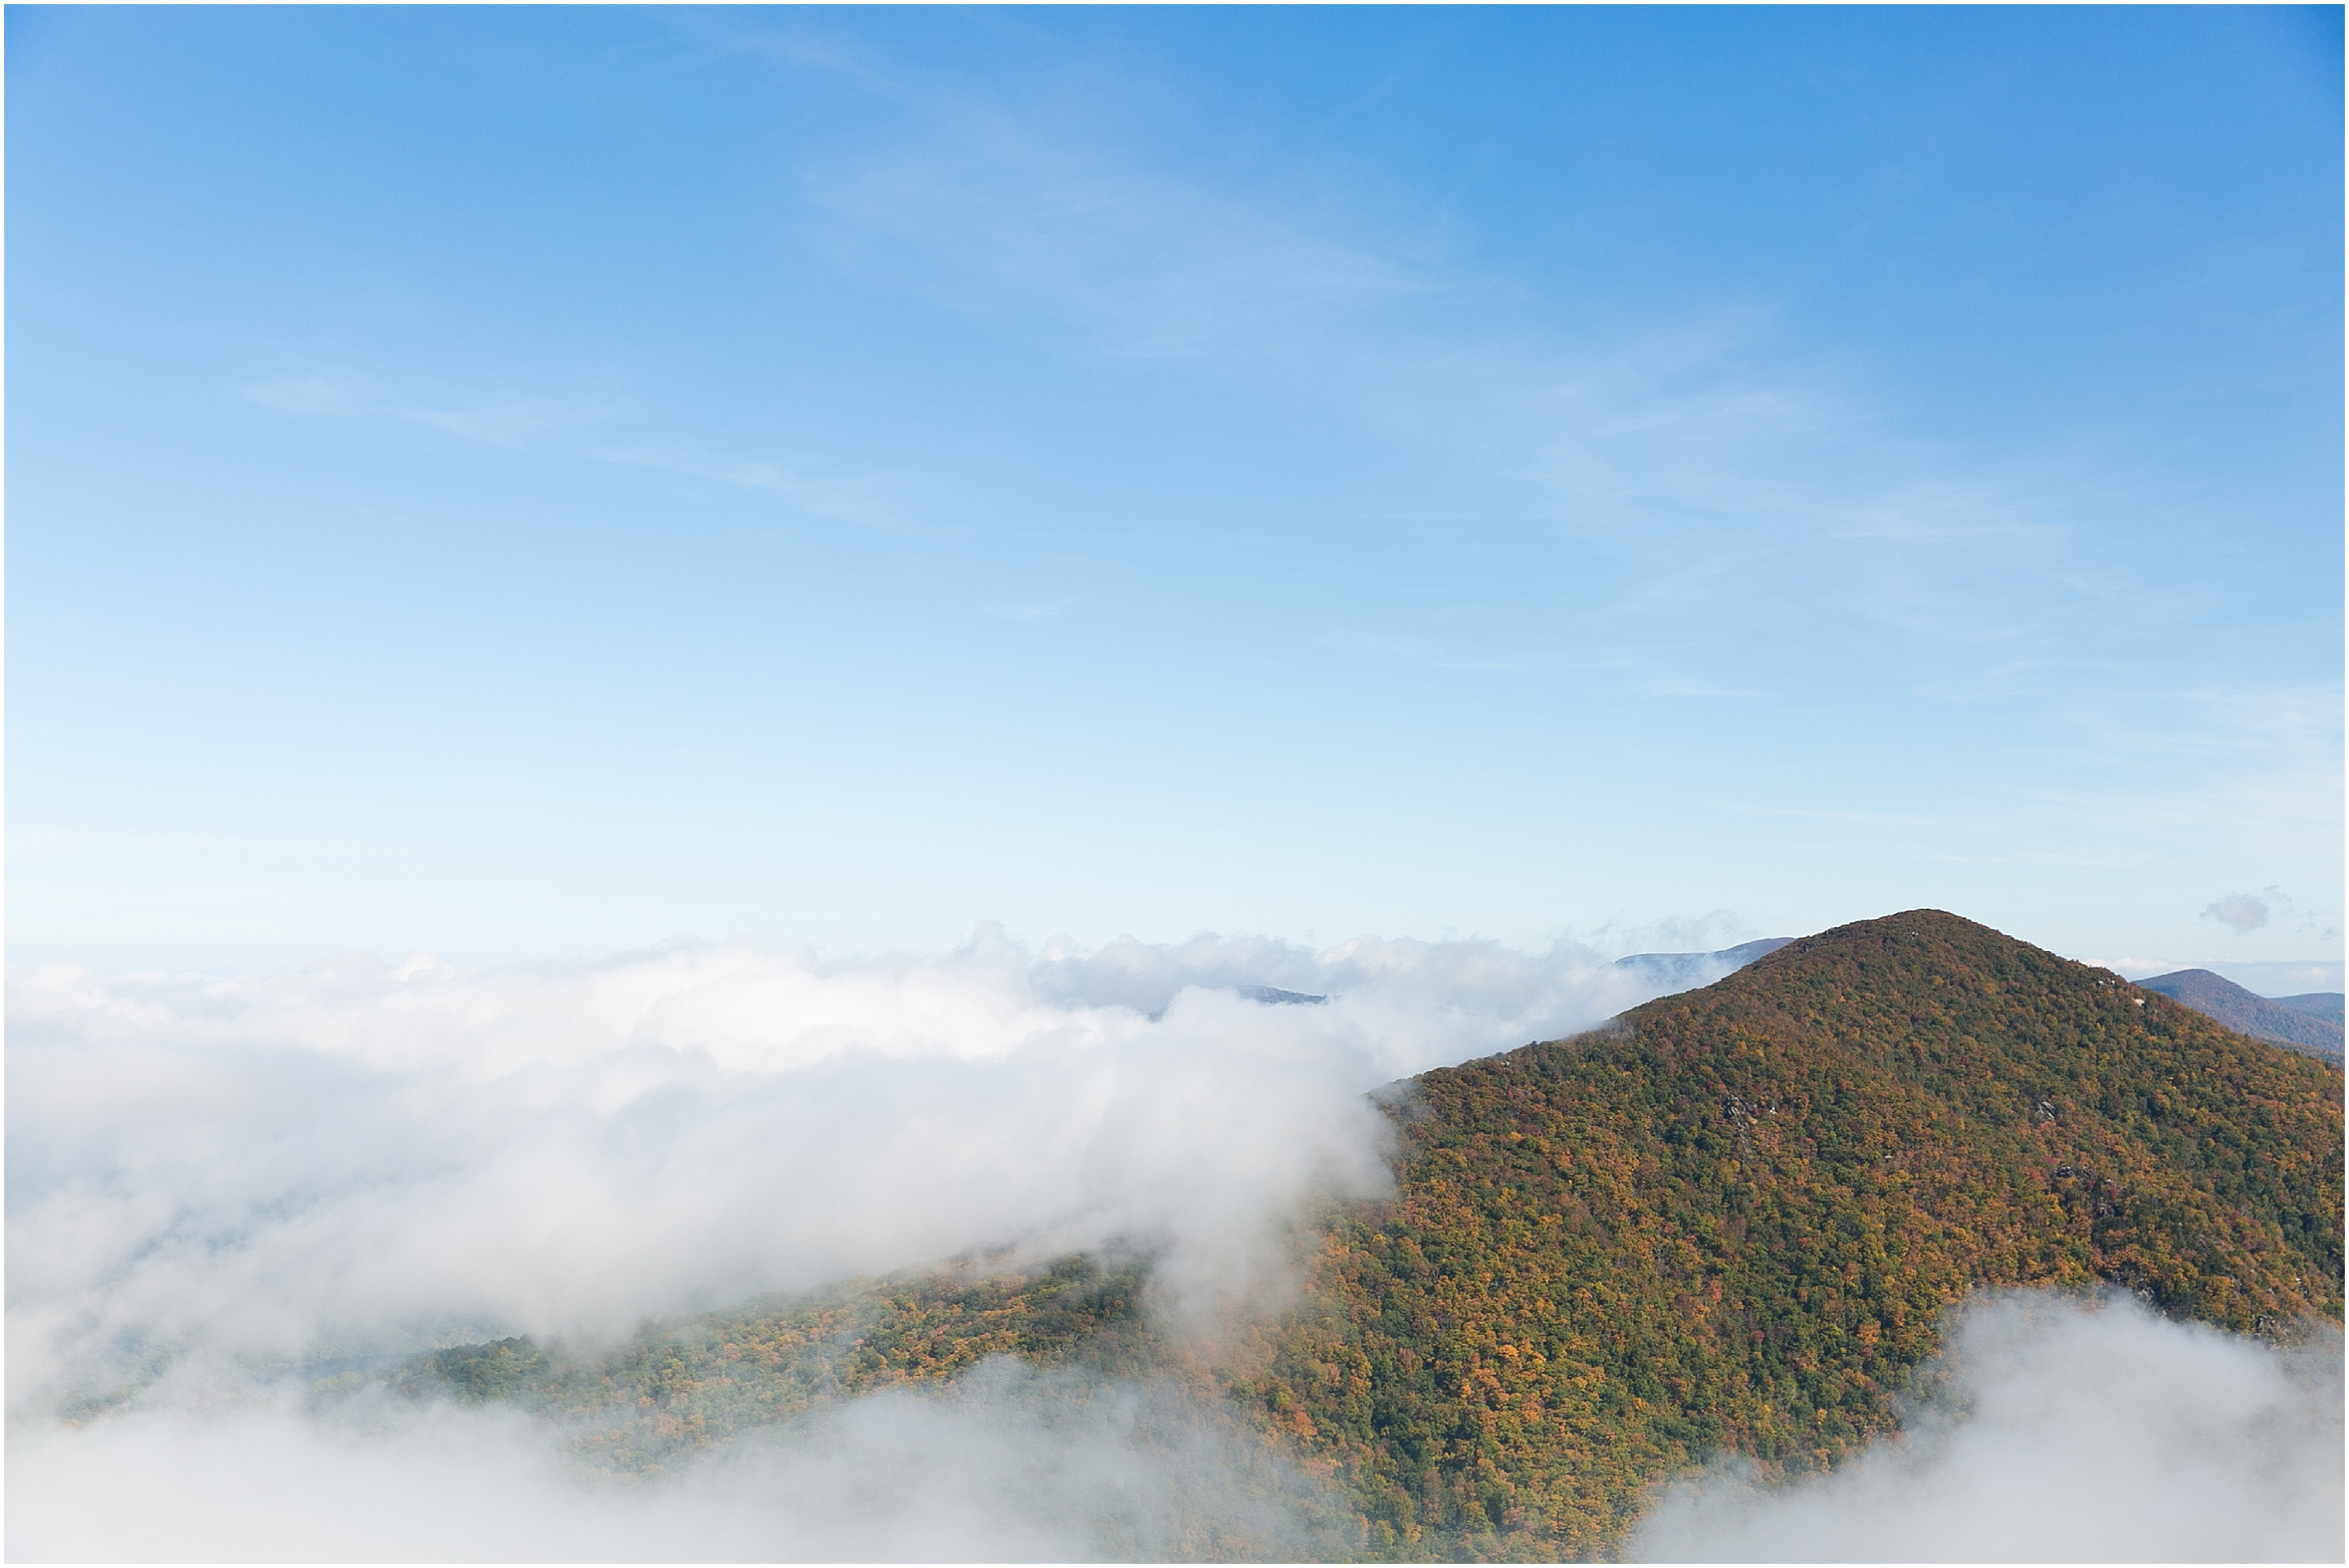 va_jessica_ryan_photography_blue_ridge_mountains_wintergreen_virginia_charlottesville_appalachian_trail_0157